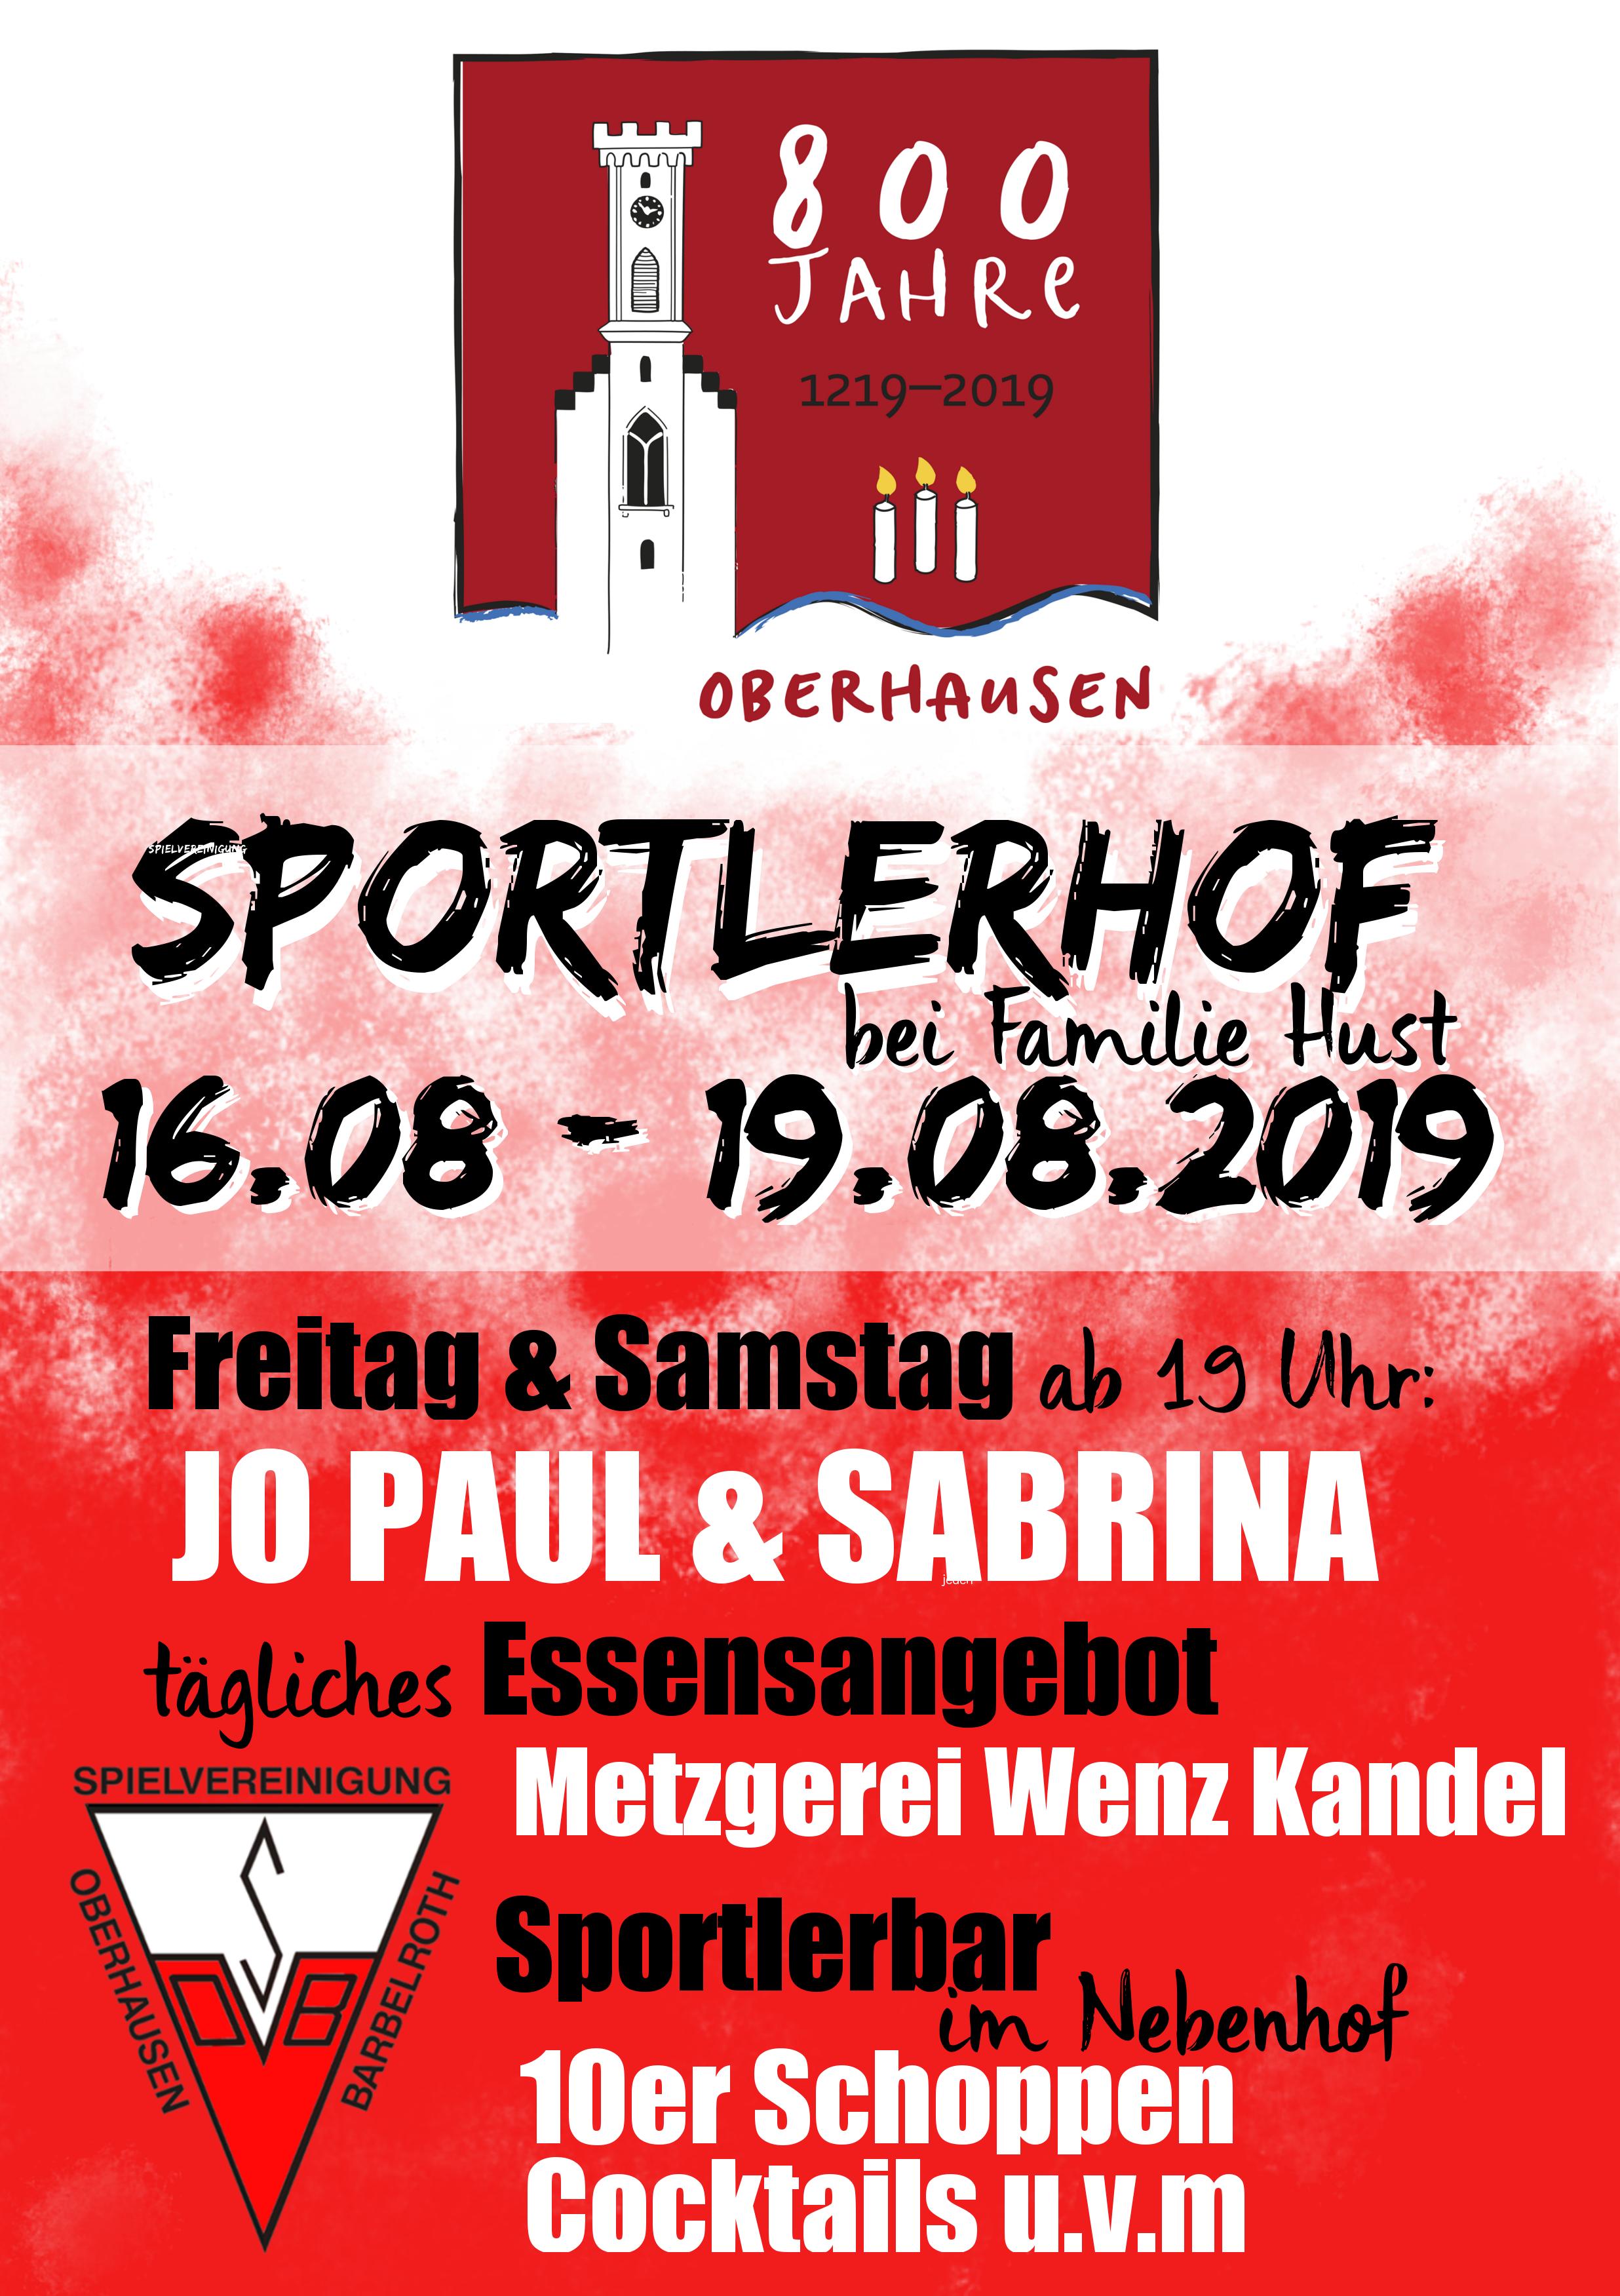 Spvgg Oberhausenbarbelroth 1919 Ev